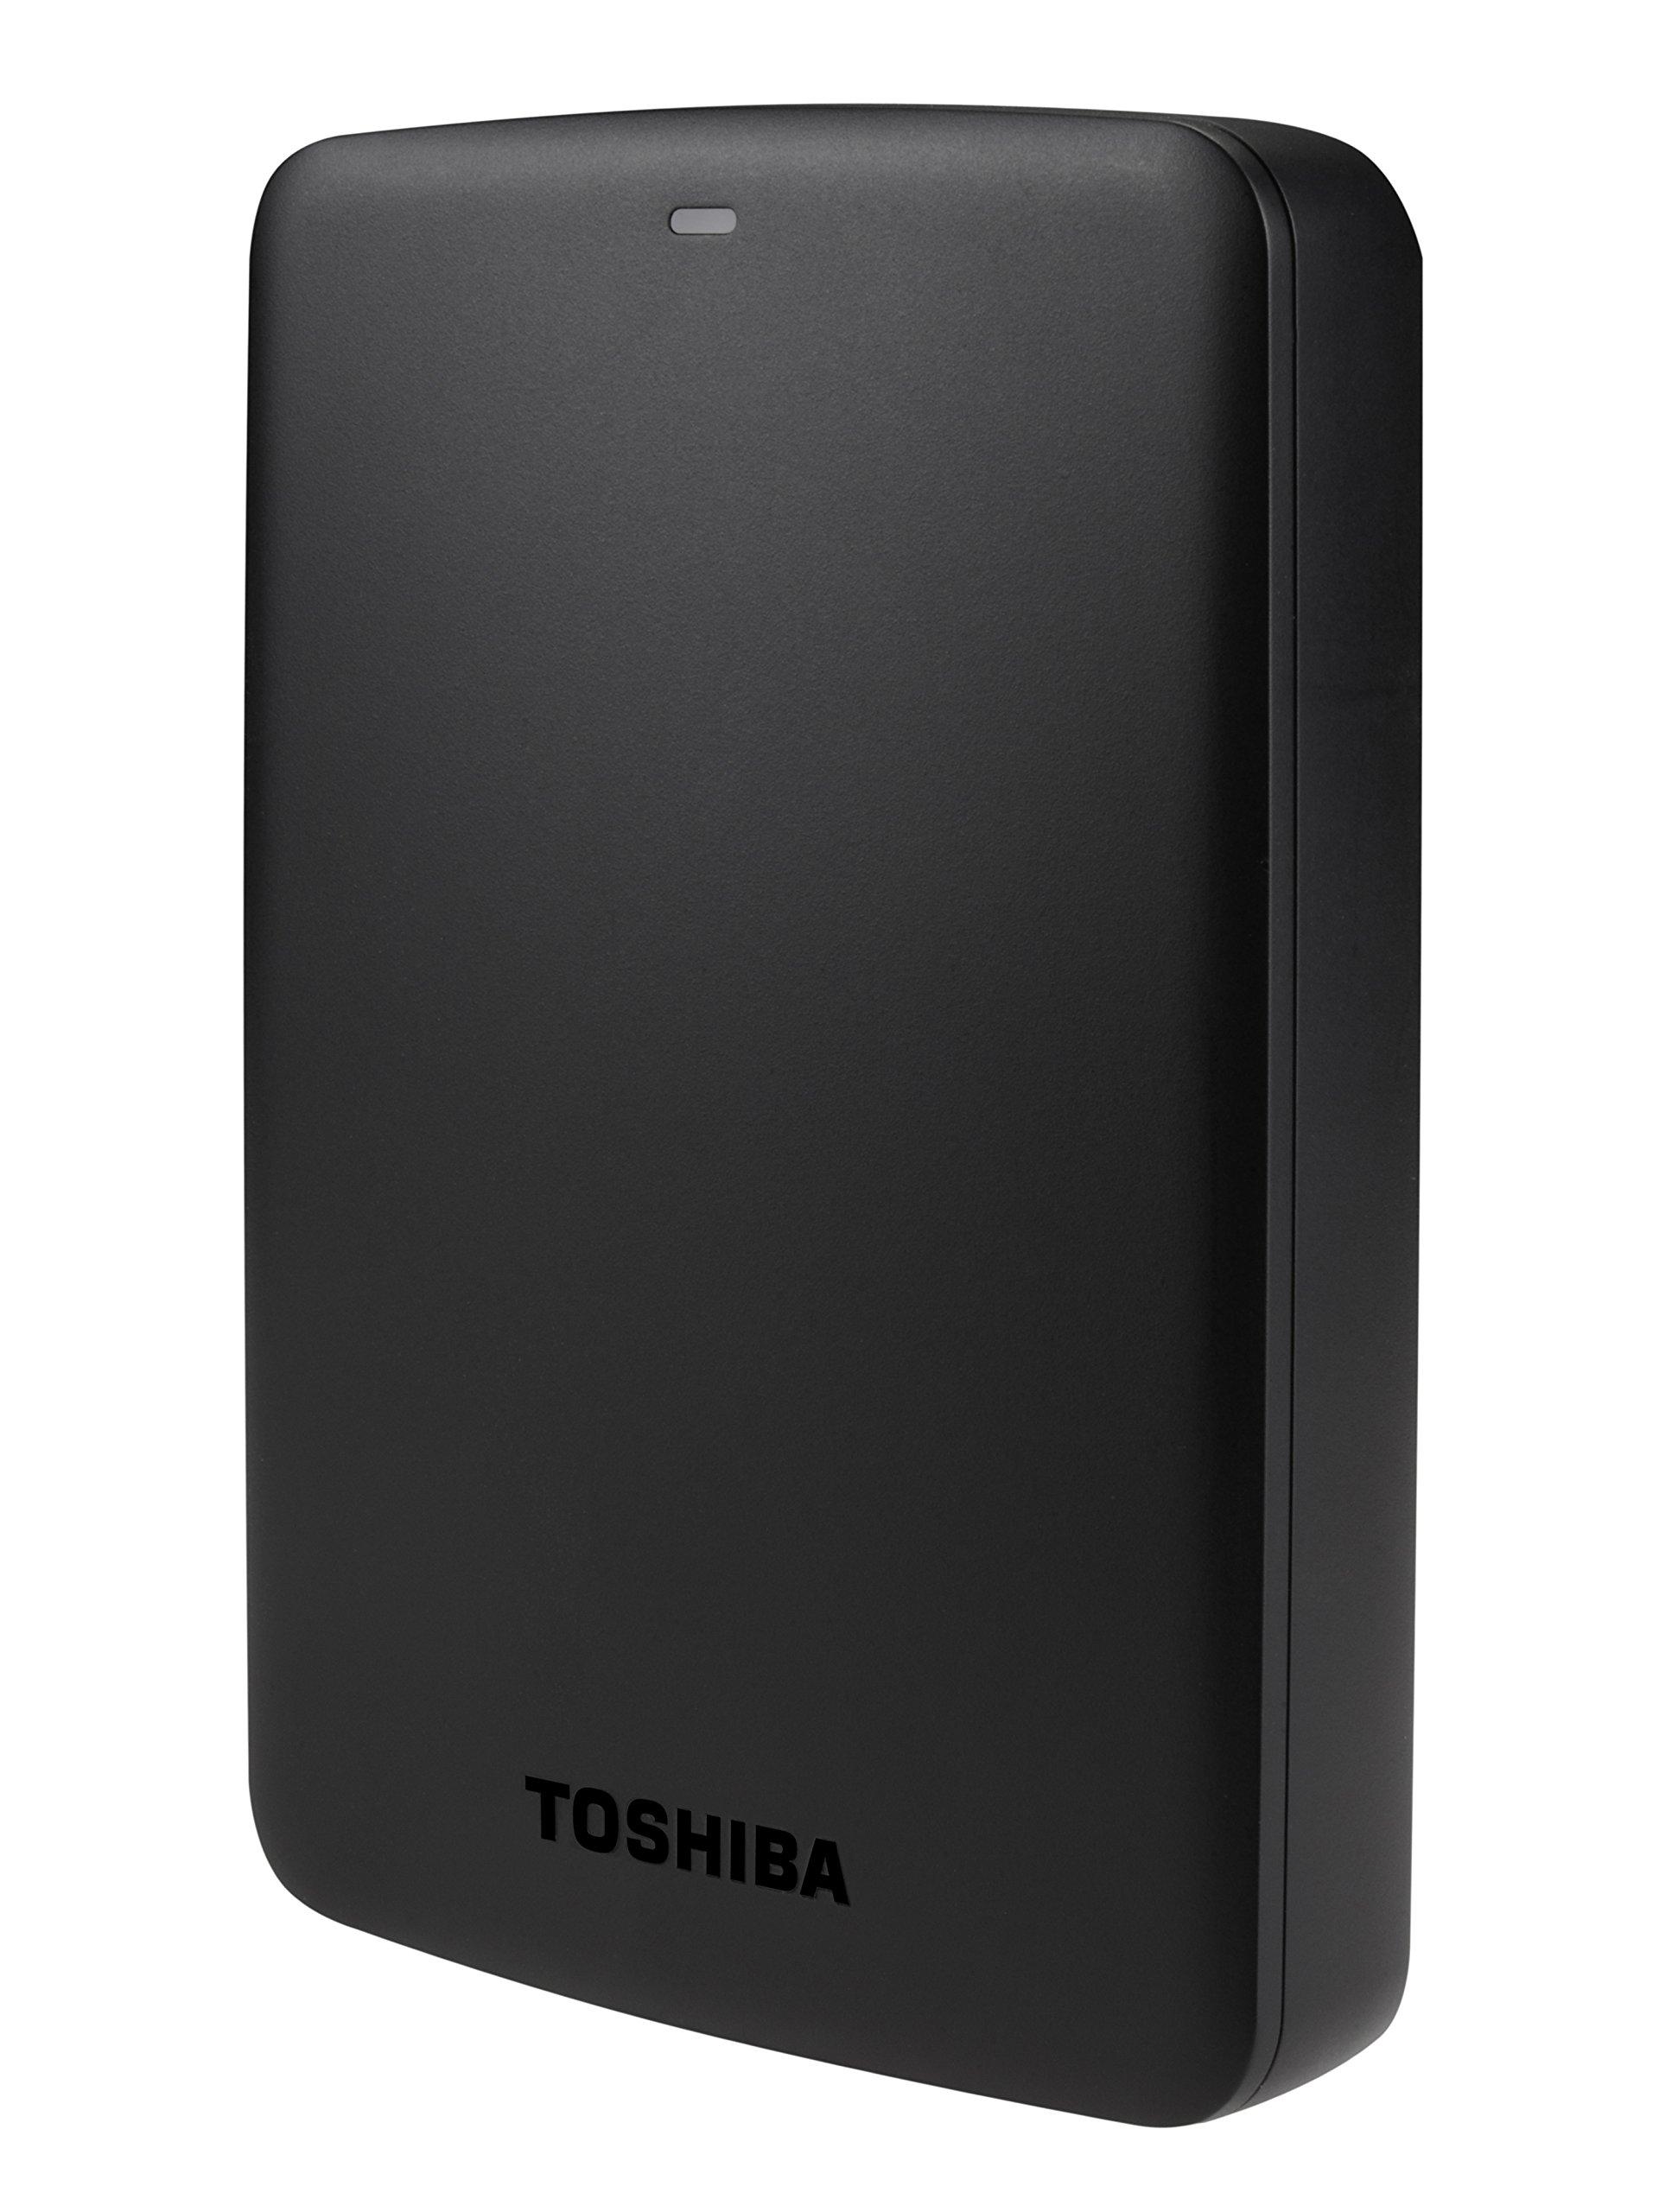 Toshiba HDTB330XK3CB Canvio Basics 3TB Portable External Hard Drive USB 3.0, Black